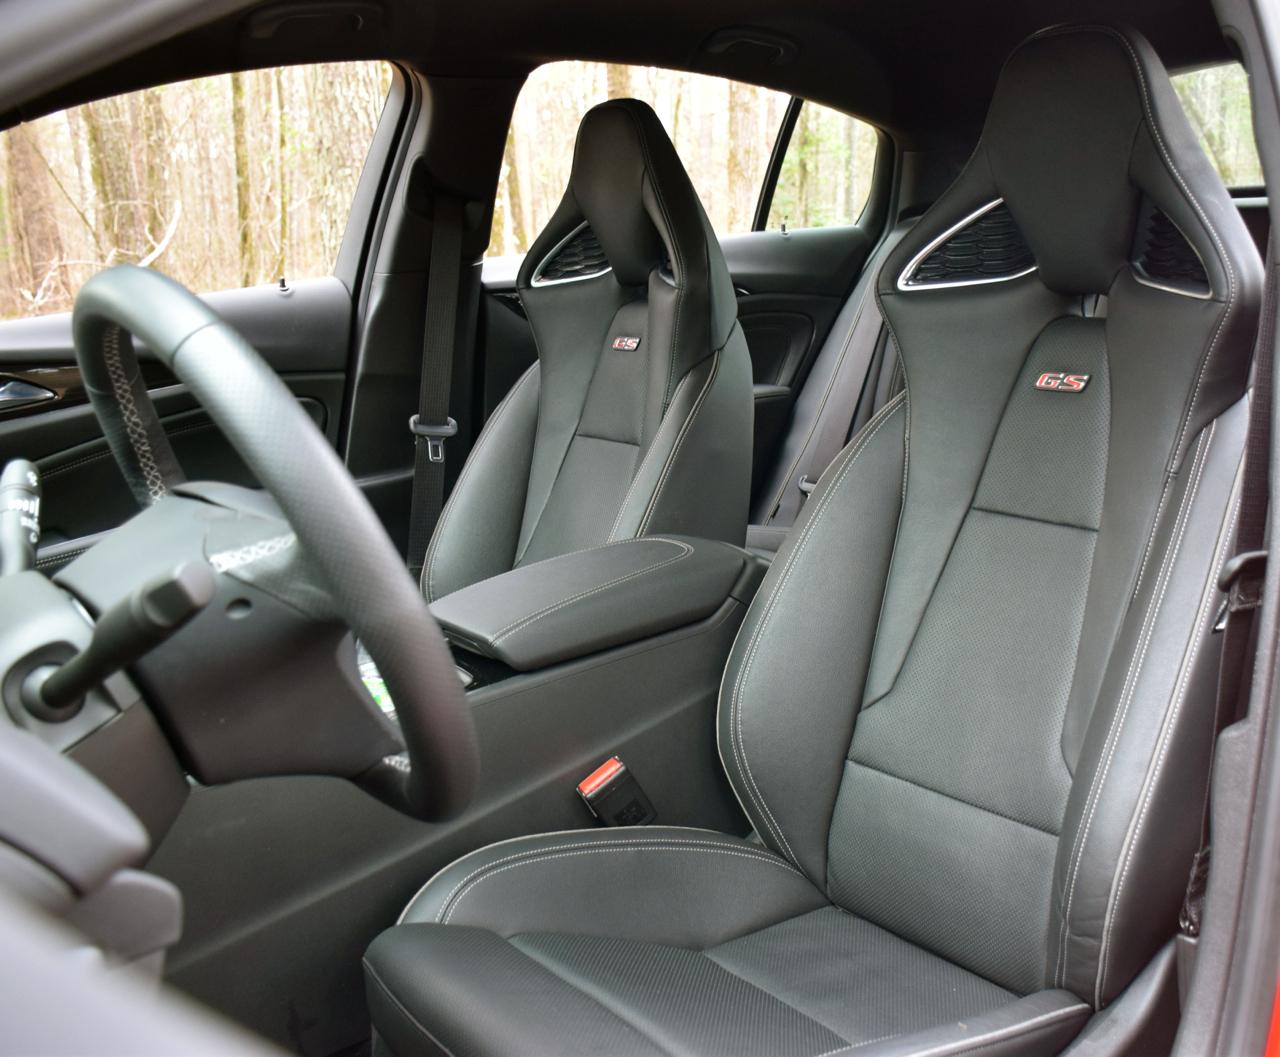 2019 Buick Regal GS